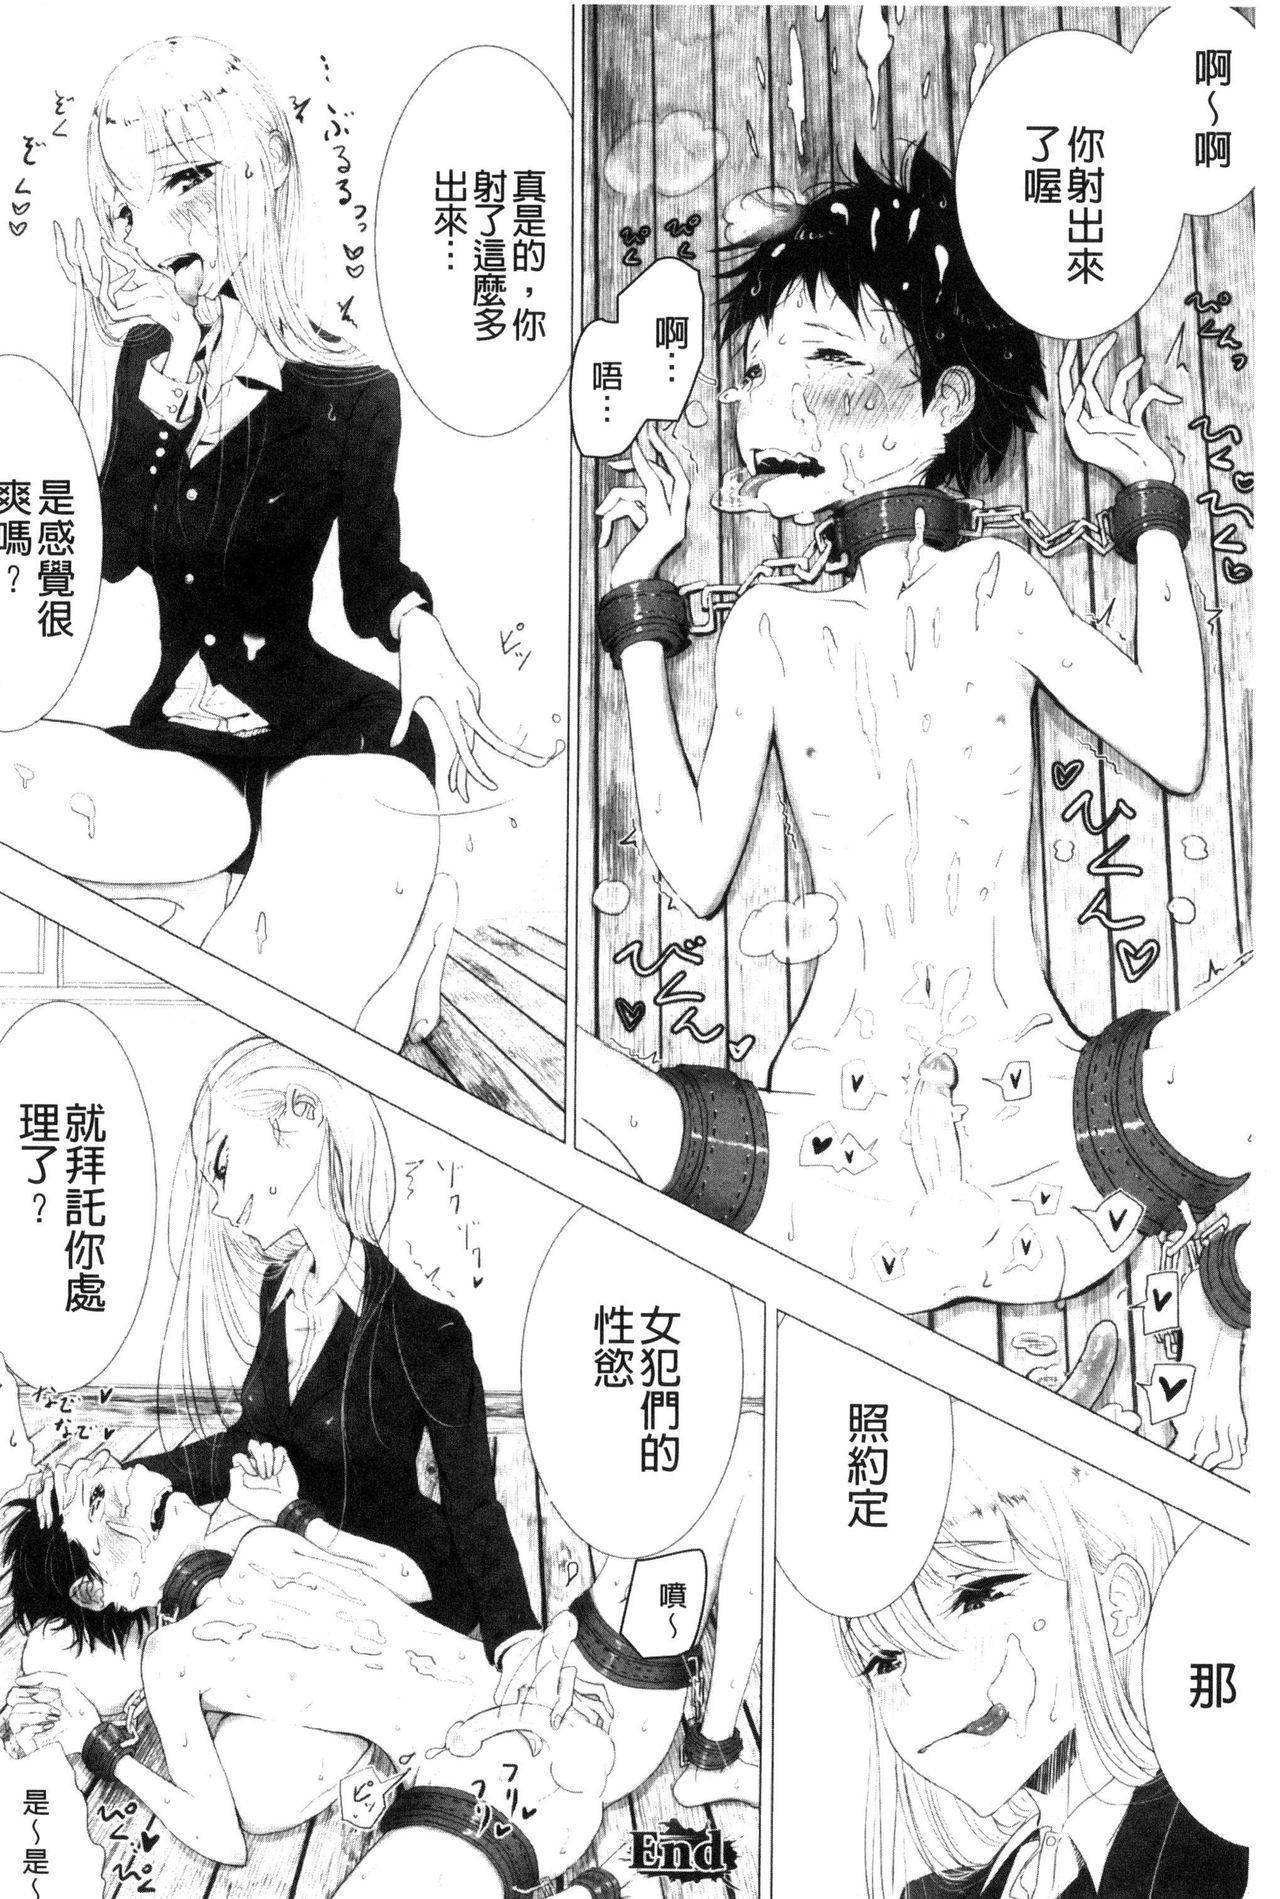 [Dhibi] Sono Yubisaki de Korogashite - Please Caress it at the Finger-tip. [Chinese] 177